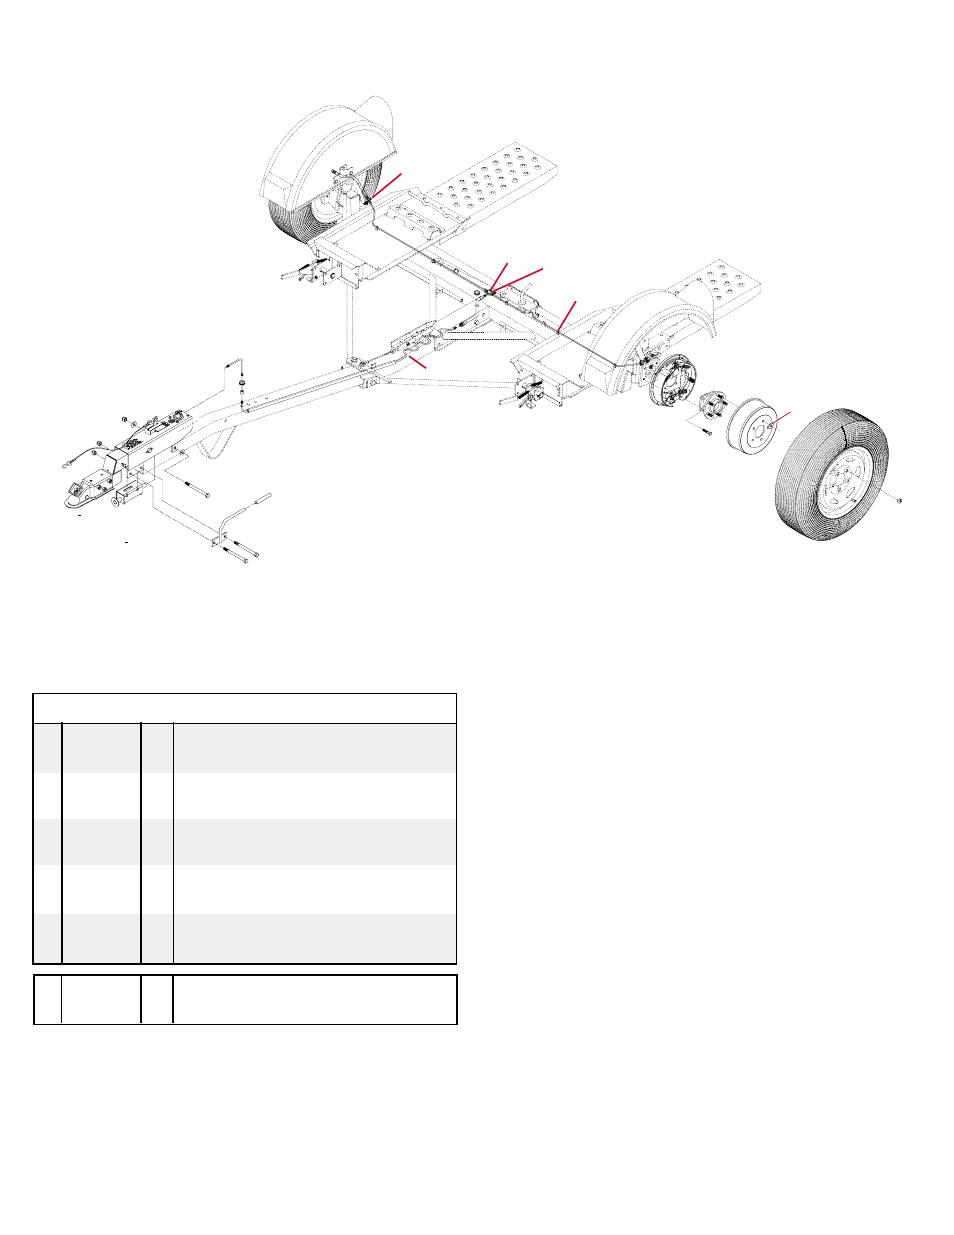 Surge Brakes Parts Breakdown Surge Brakes Parts List Bleeding The